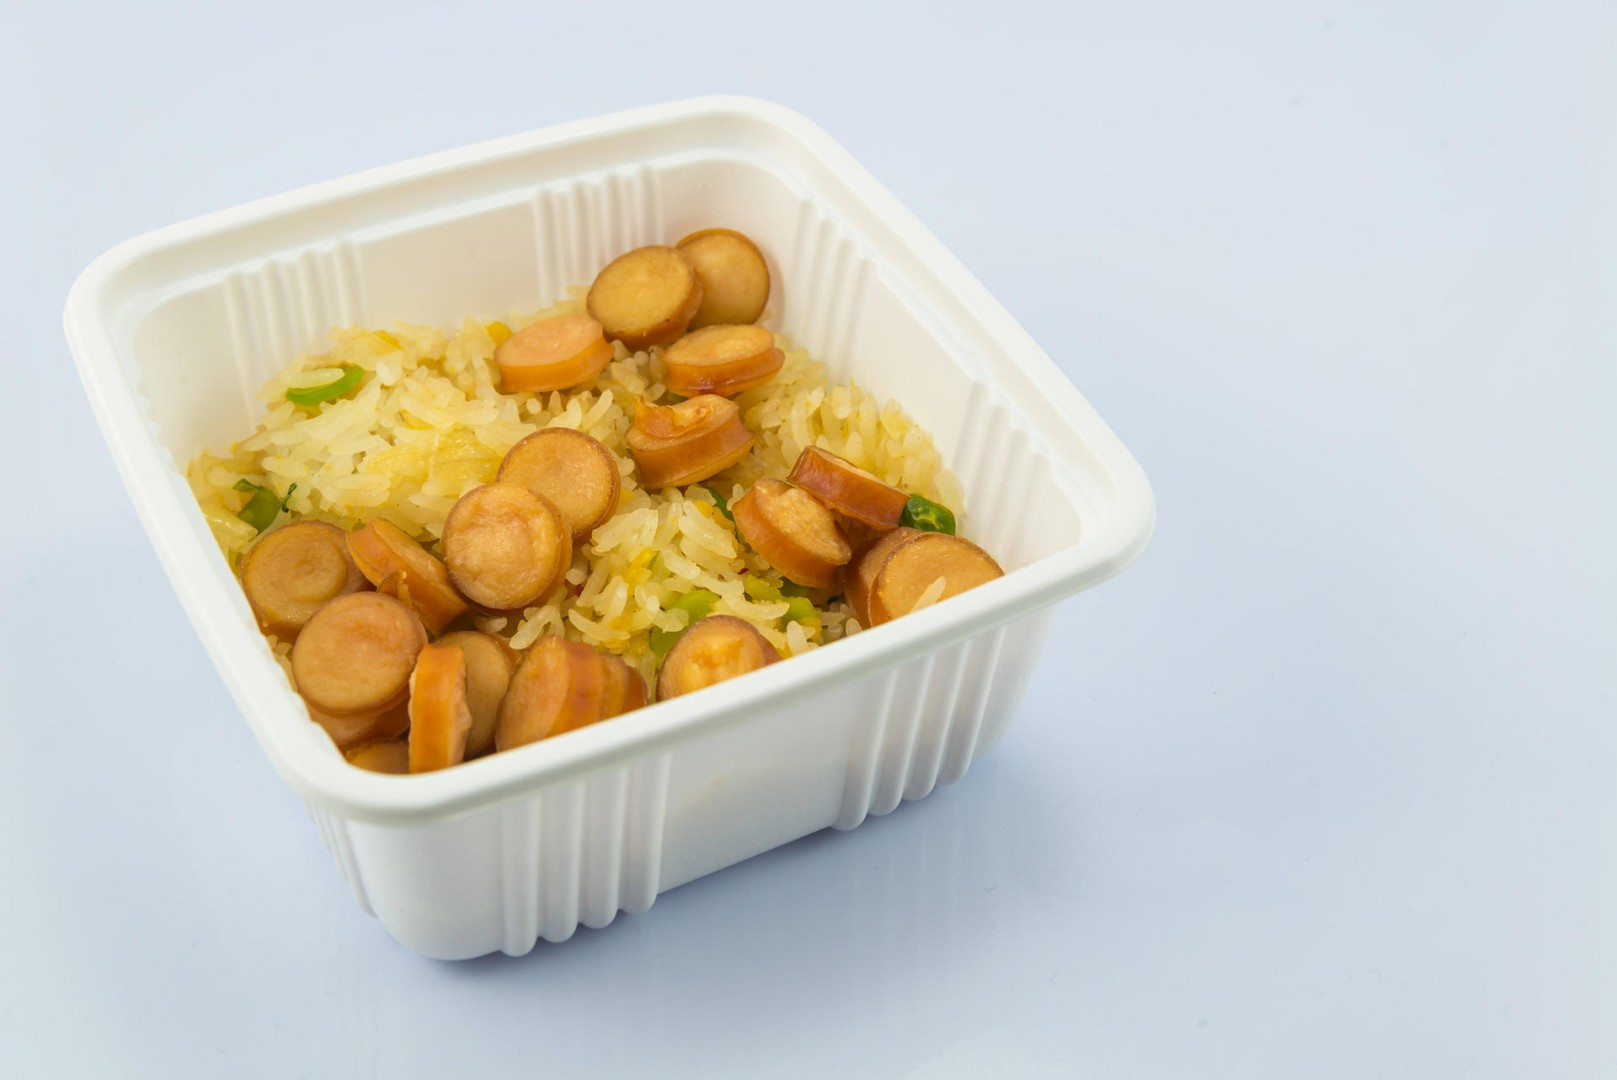 Microwaving Food In Ordinary Plastic